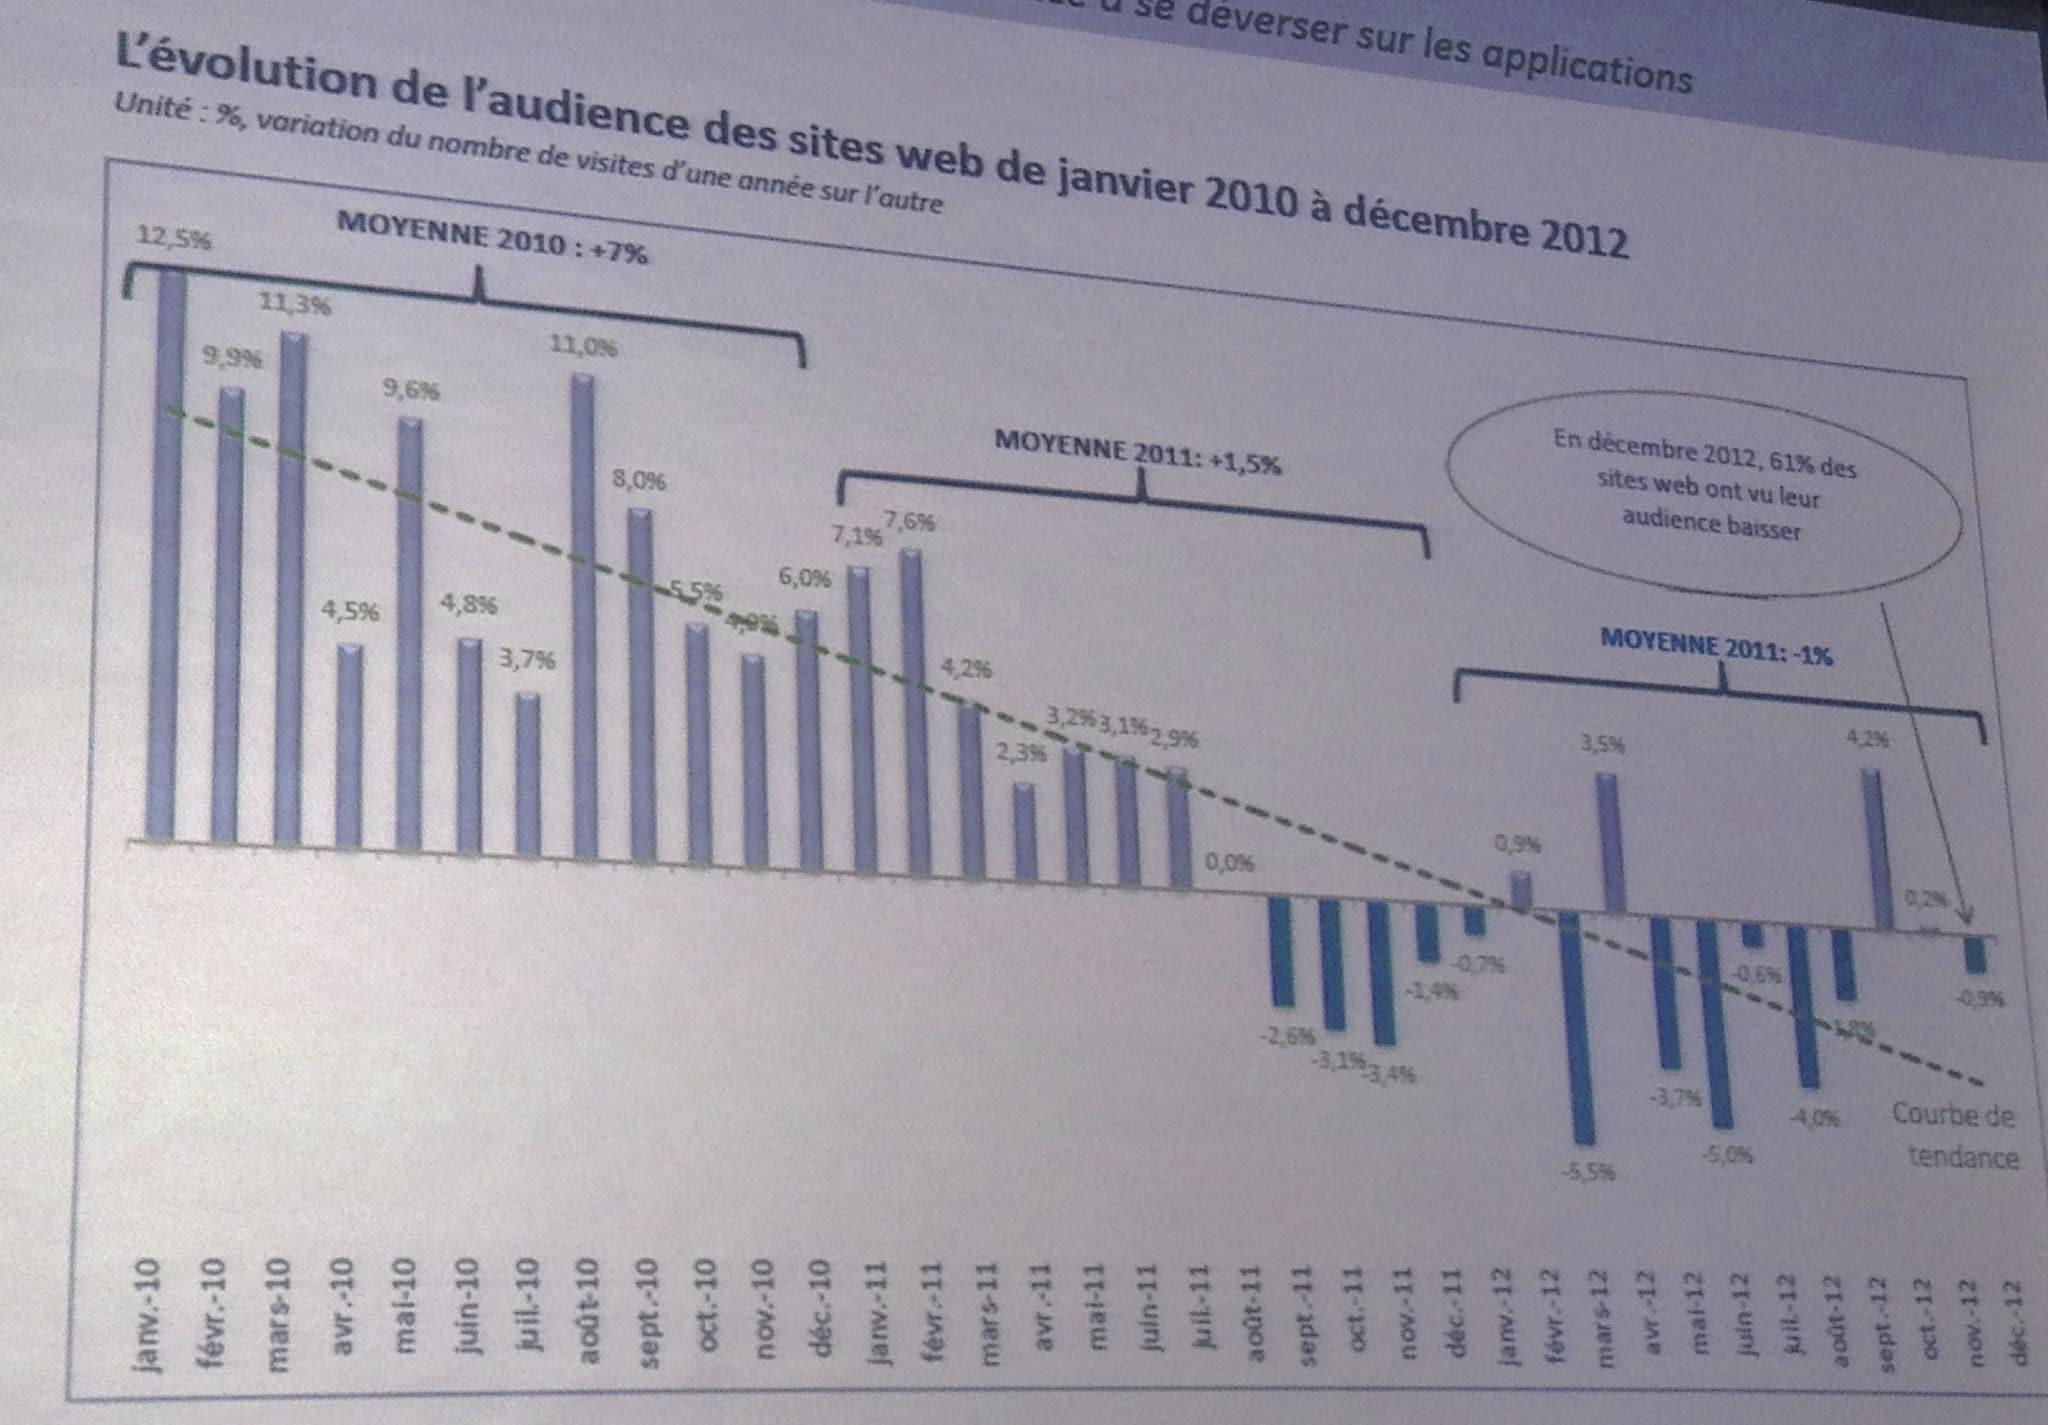 Trafic web vers mobile - mediaculture.fr